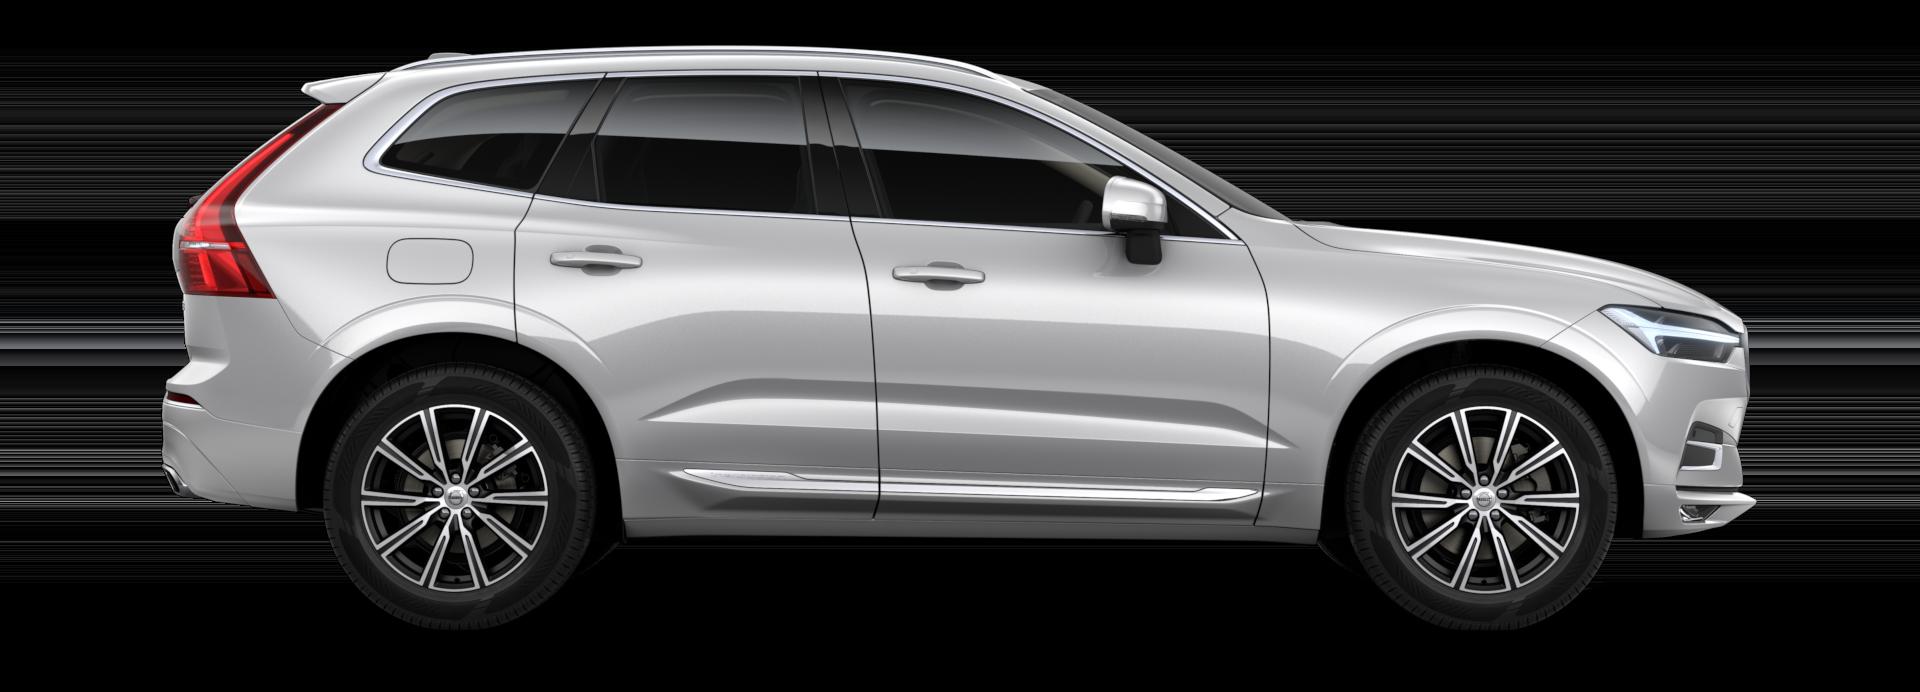 2019 Volvo Xc70 >> 2018 Volvo XC60 Info, Price, and Specs | Lovering Volvo Cars Concord